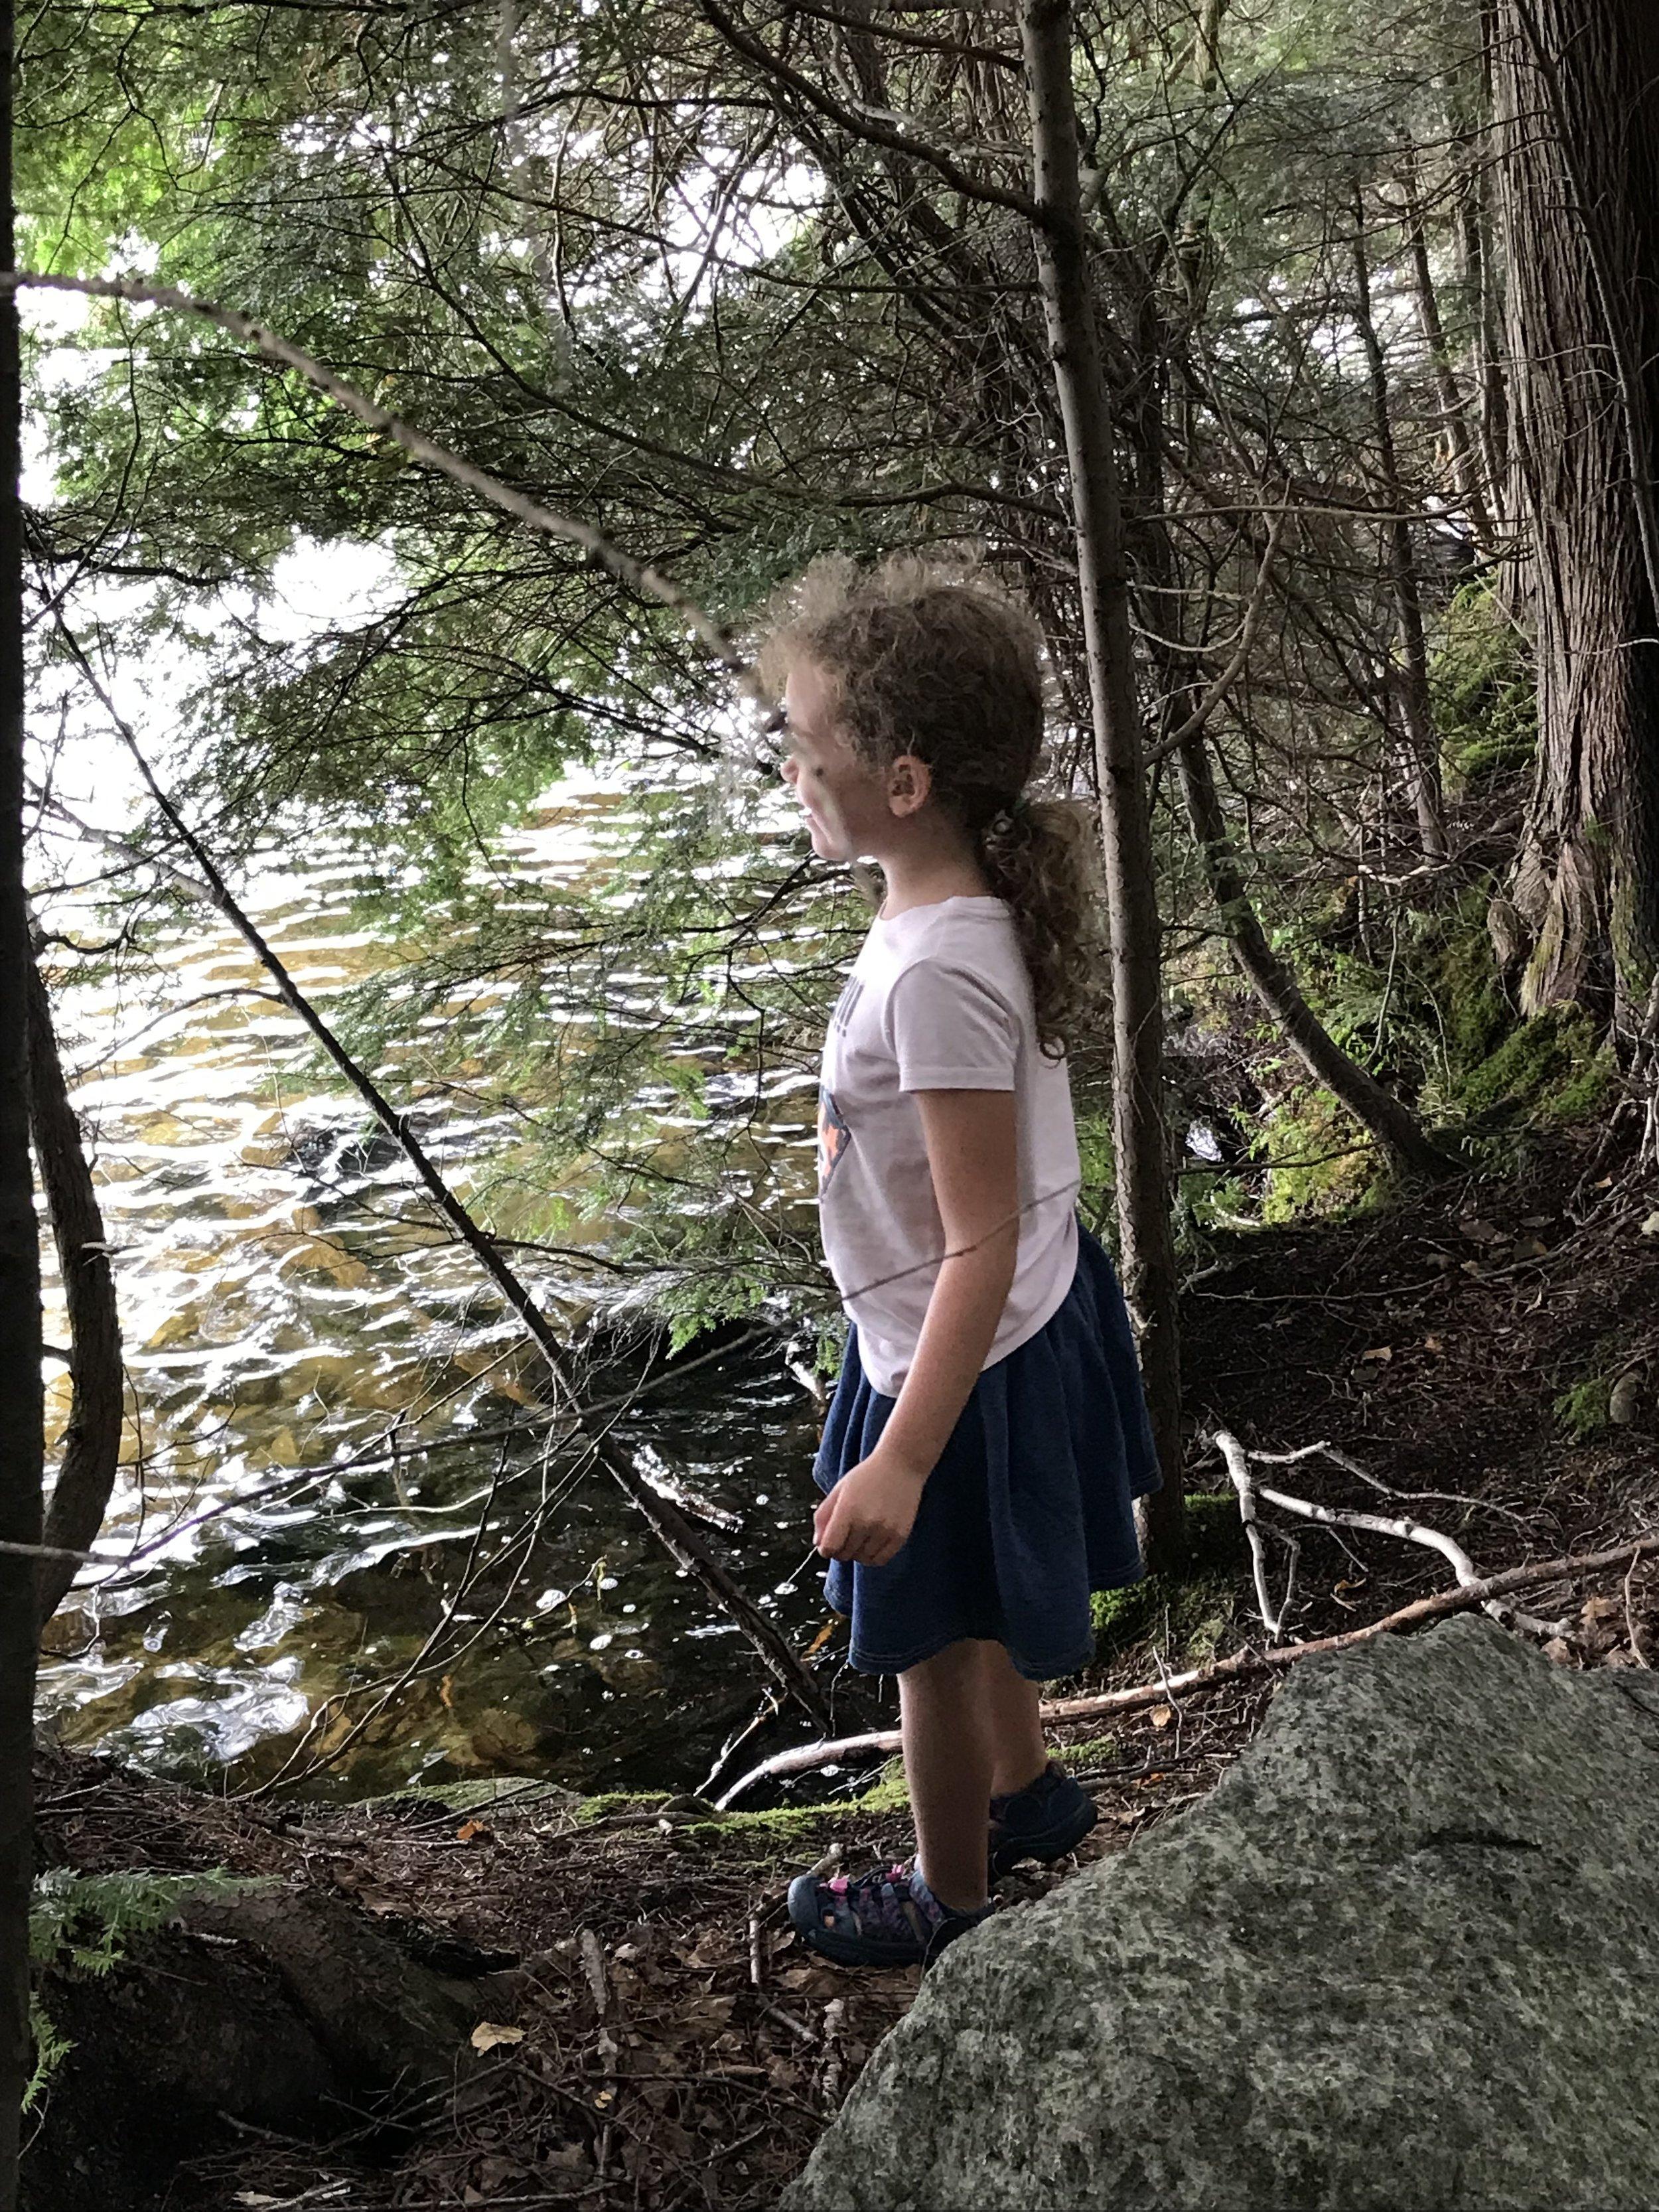 Lena Gabrielsen Eagle Island Aug 18 2018.jpg